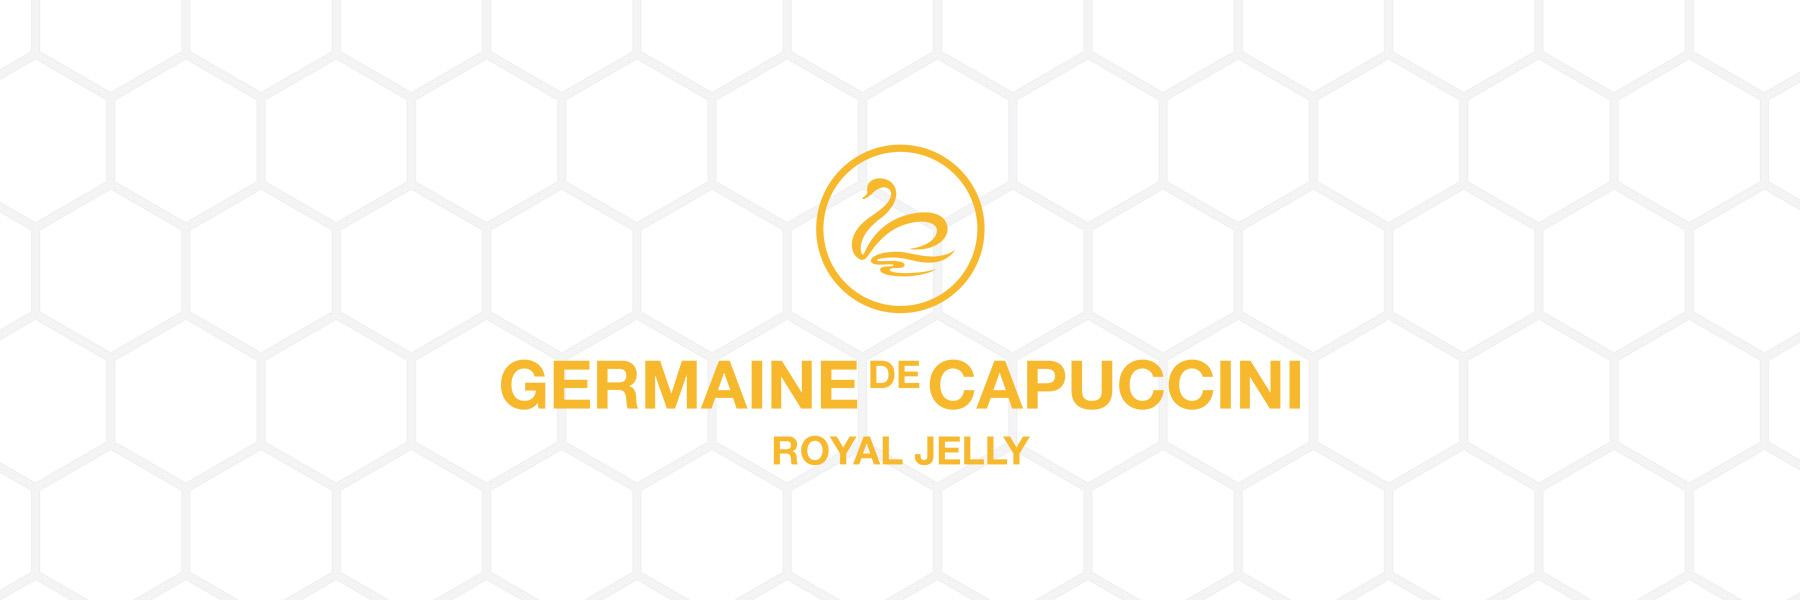 Germaine de Capuccini Wavre